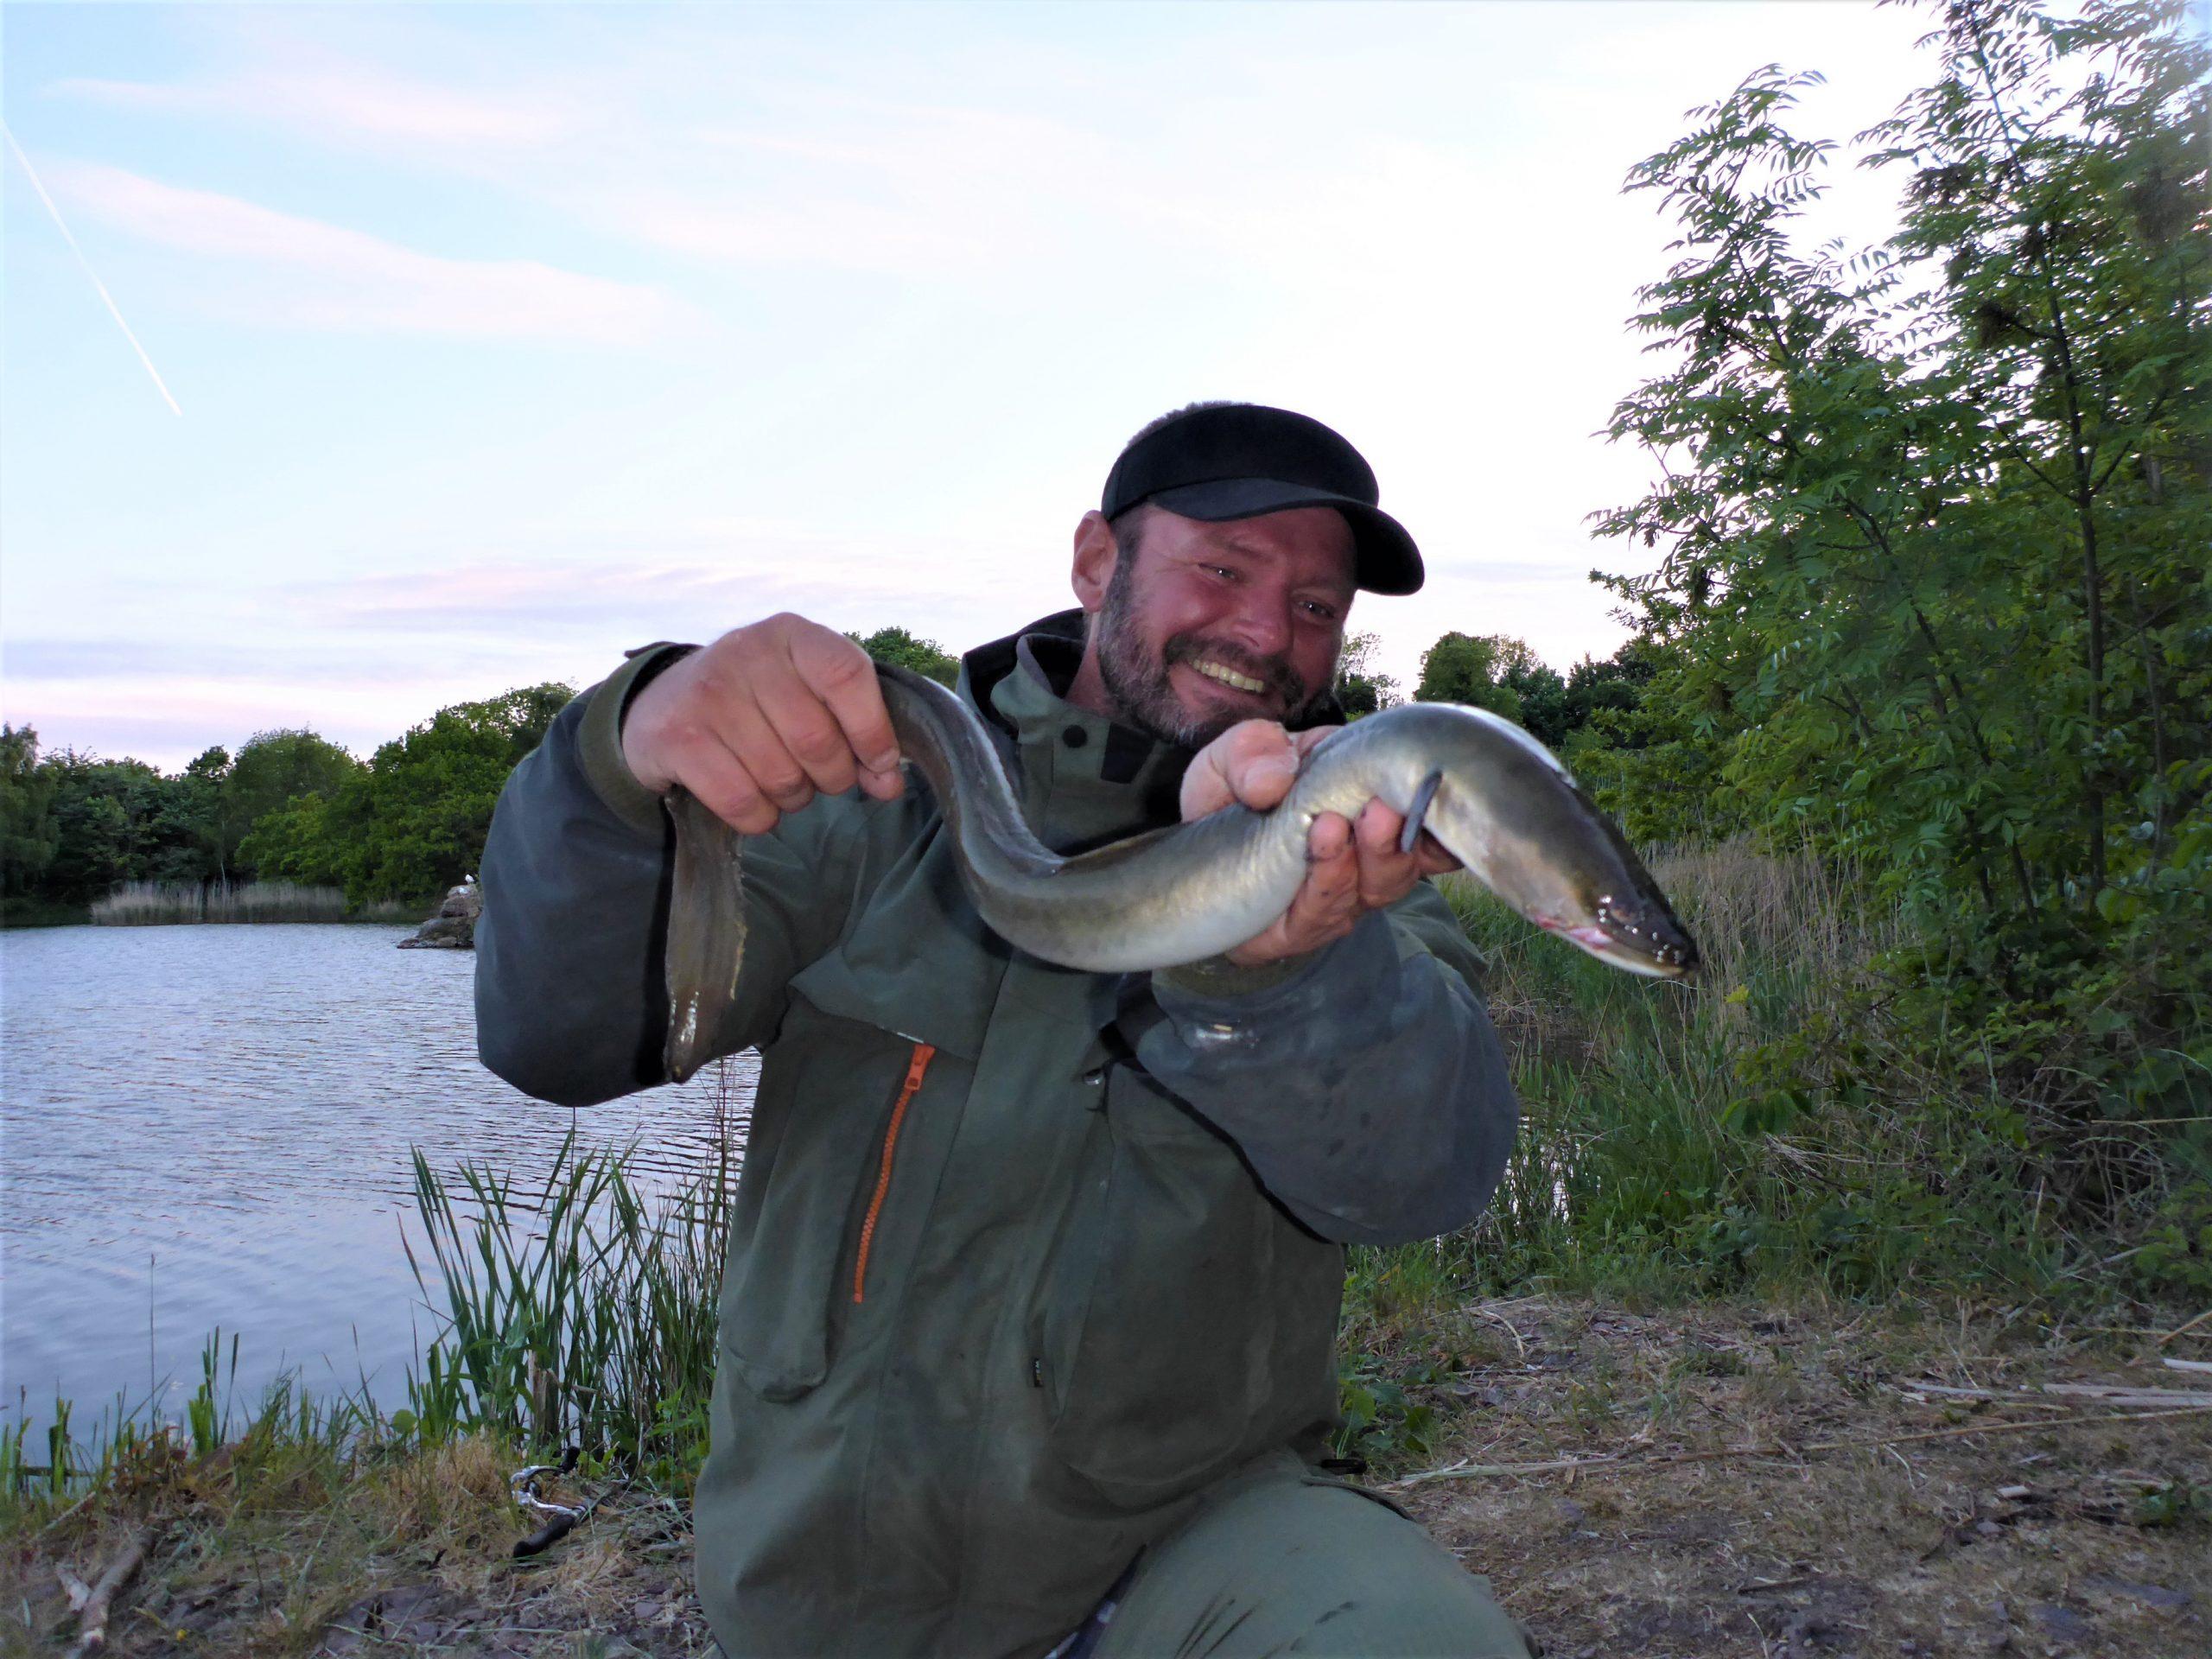 Lystfiskeri efter ål på Bornholm